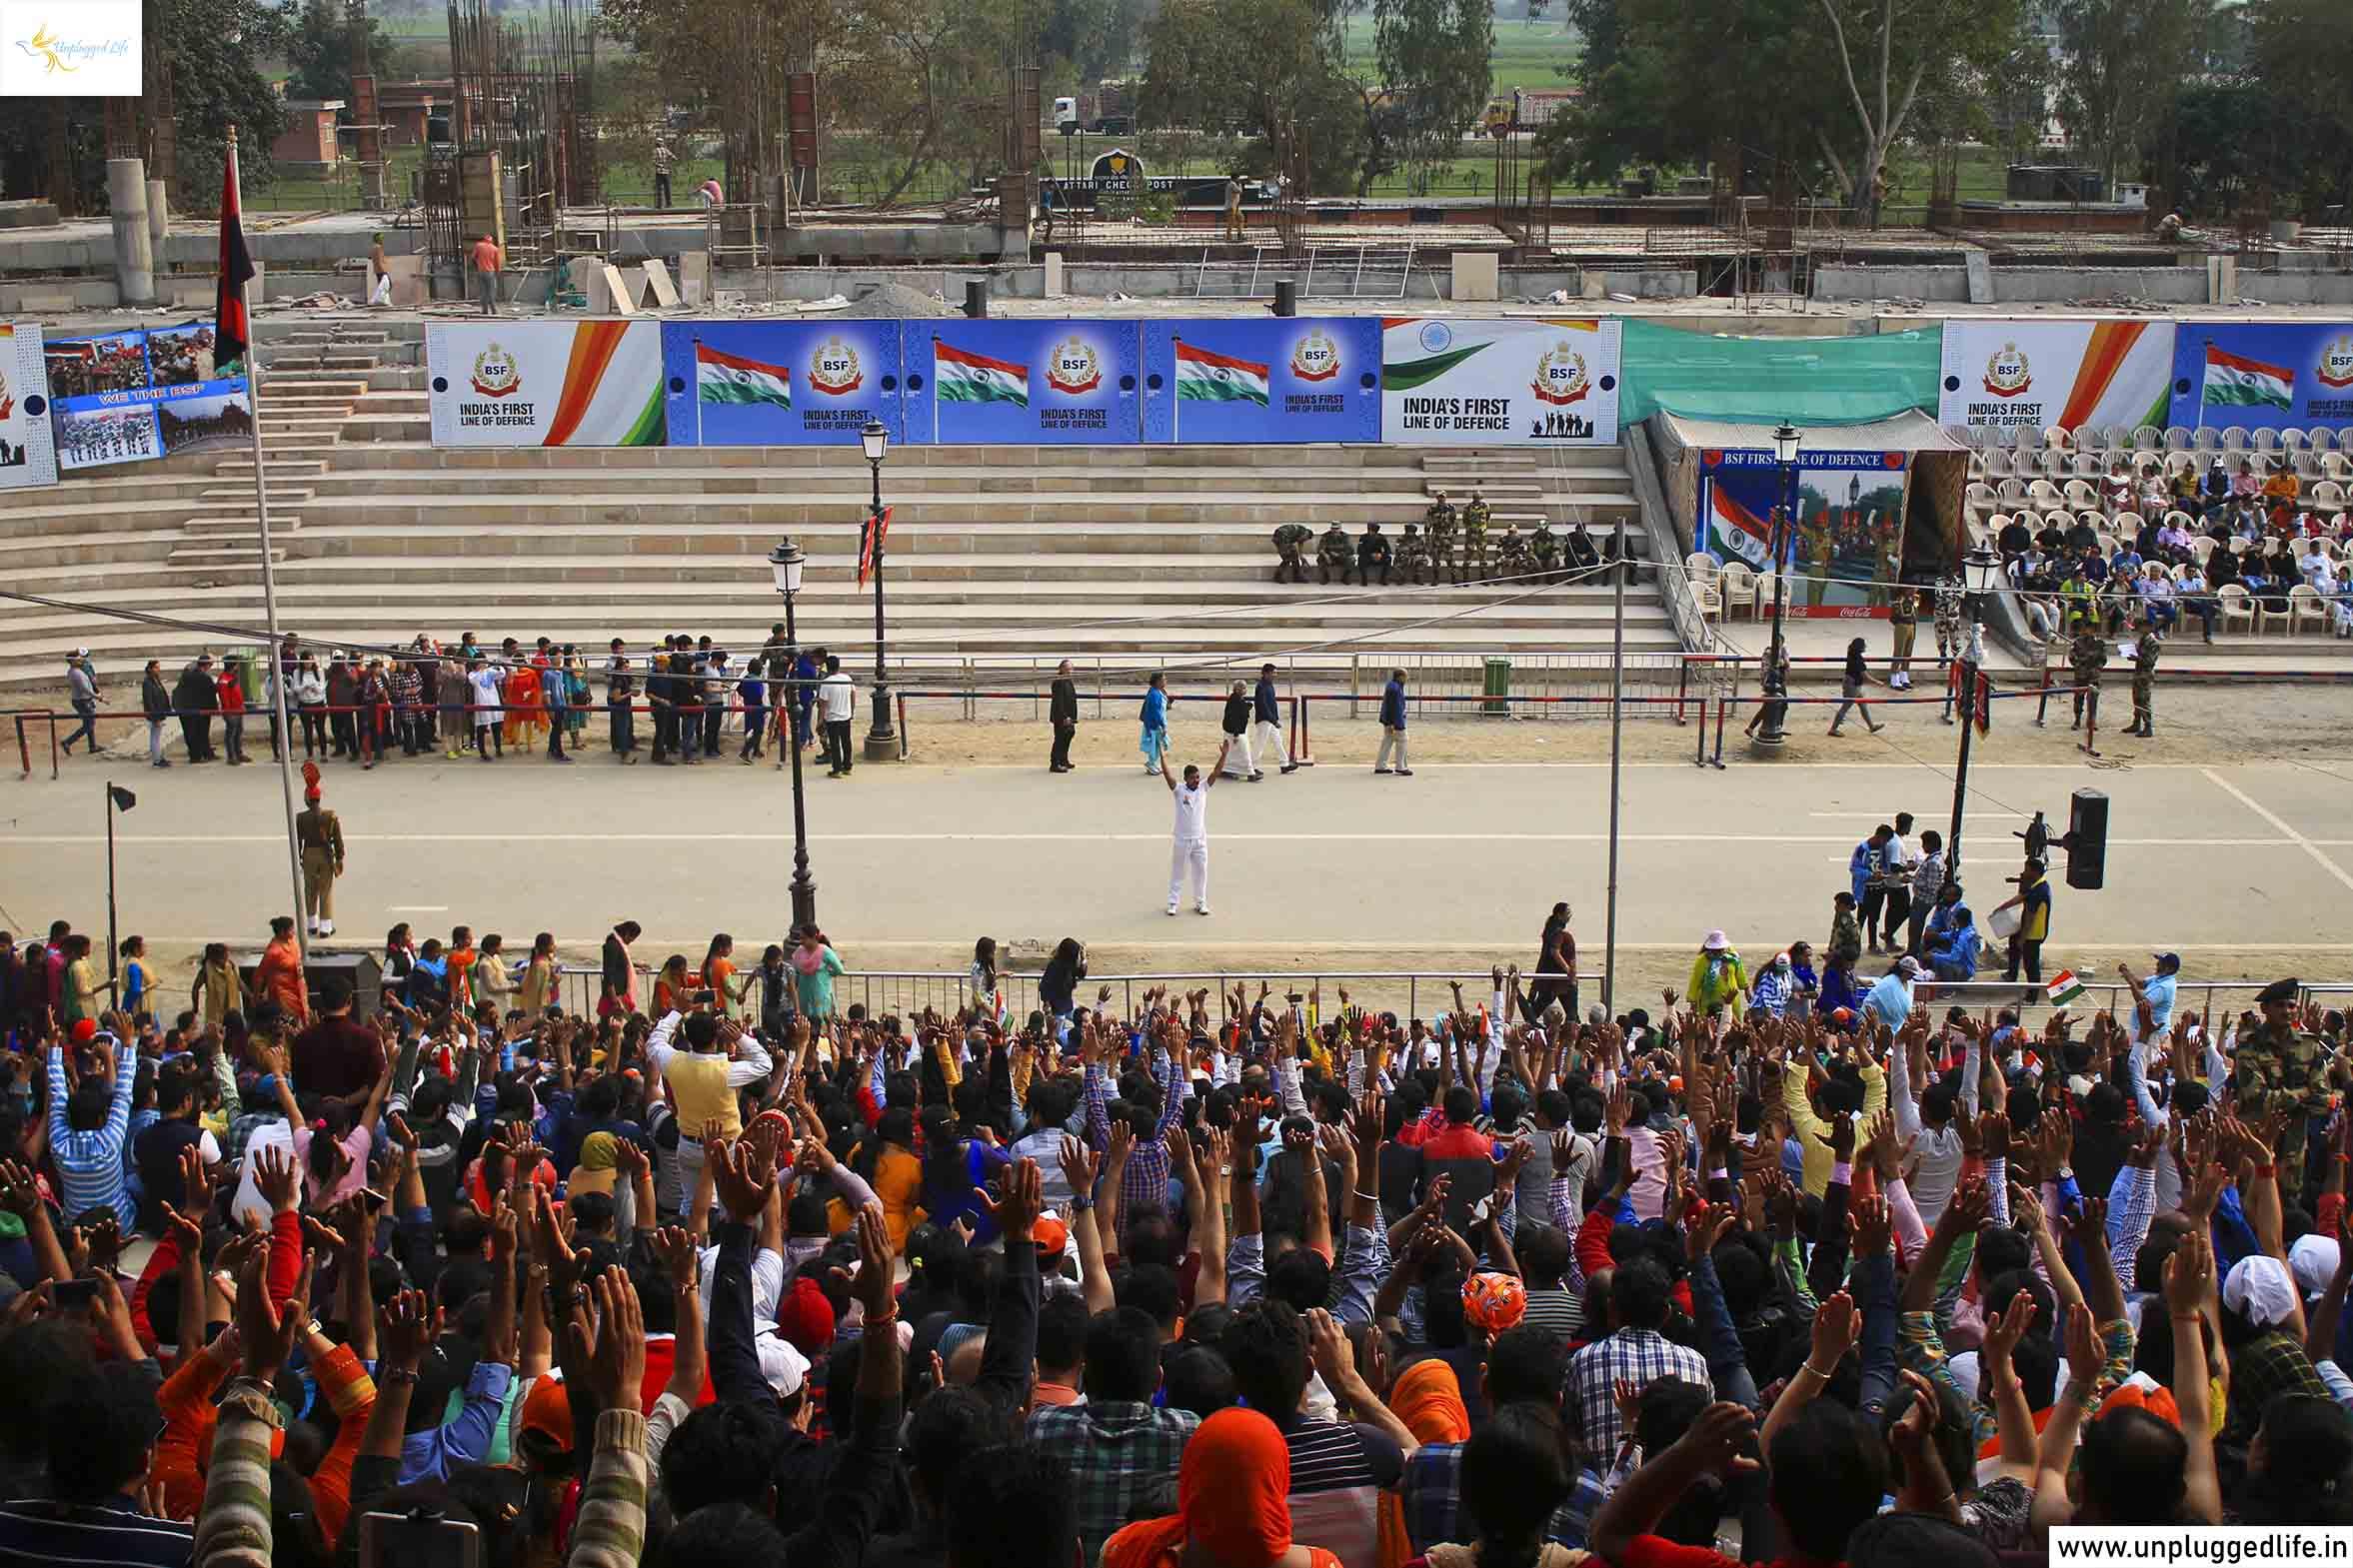 Attari - Wagah Border, India and Pakistan, Unplugged Life, Punjab, Amritsar, Indian Army, pride, cheering, full stadium, Amritsar Tour Package, Punjab Tour Package, Dharamshala Itinerary, Himachal Pradesh Itinerary, Amritsar to Dalhousie, Amritsar to Dharamshala, Dharamshala to Dalhousie,